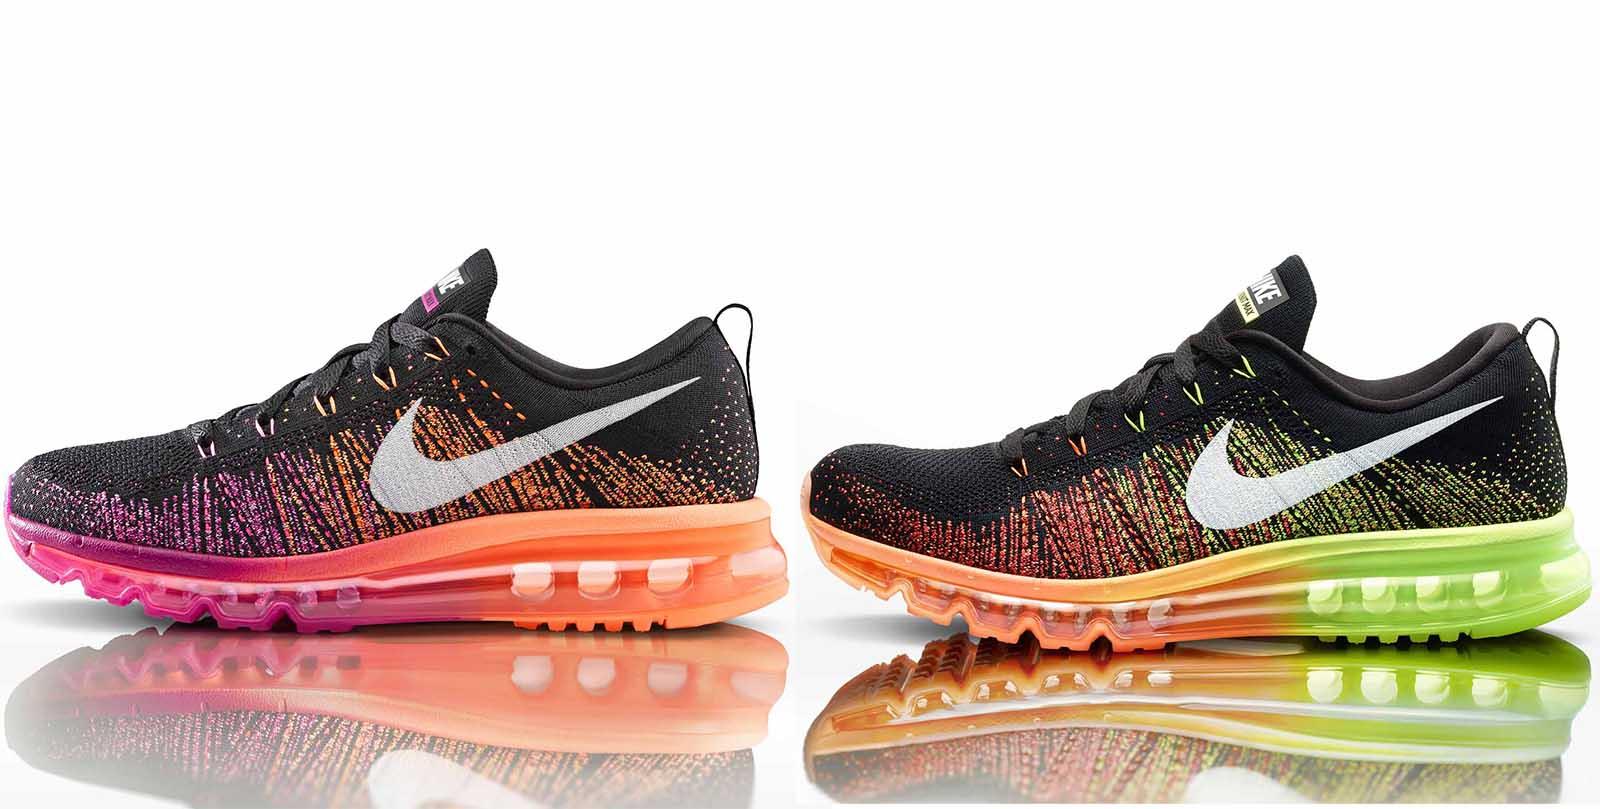 Nike Flyknit Air Max 2014